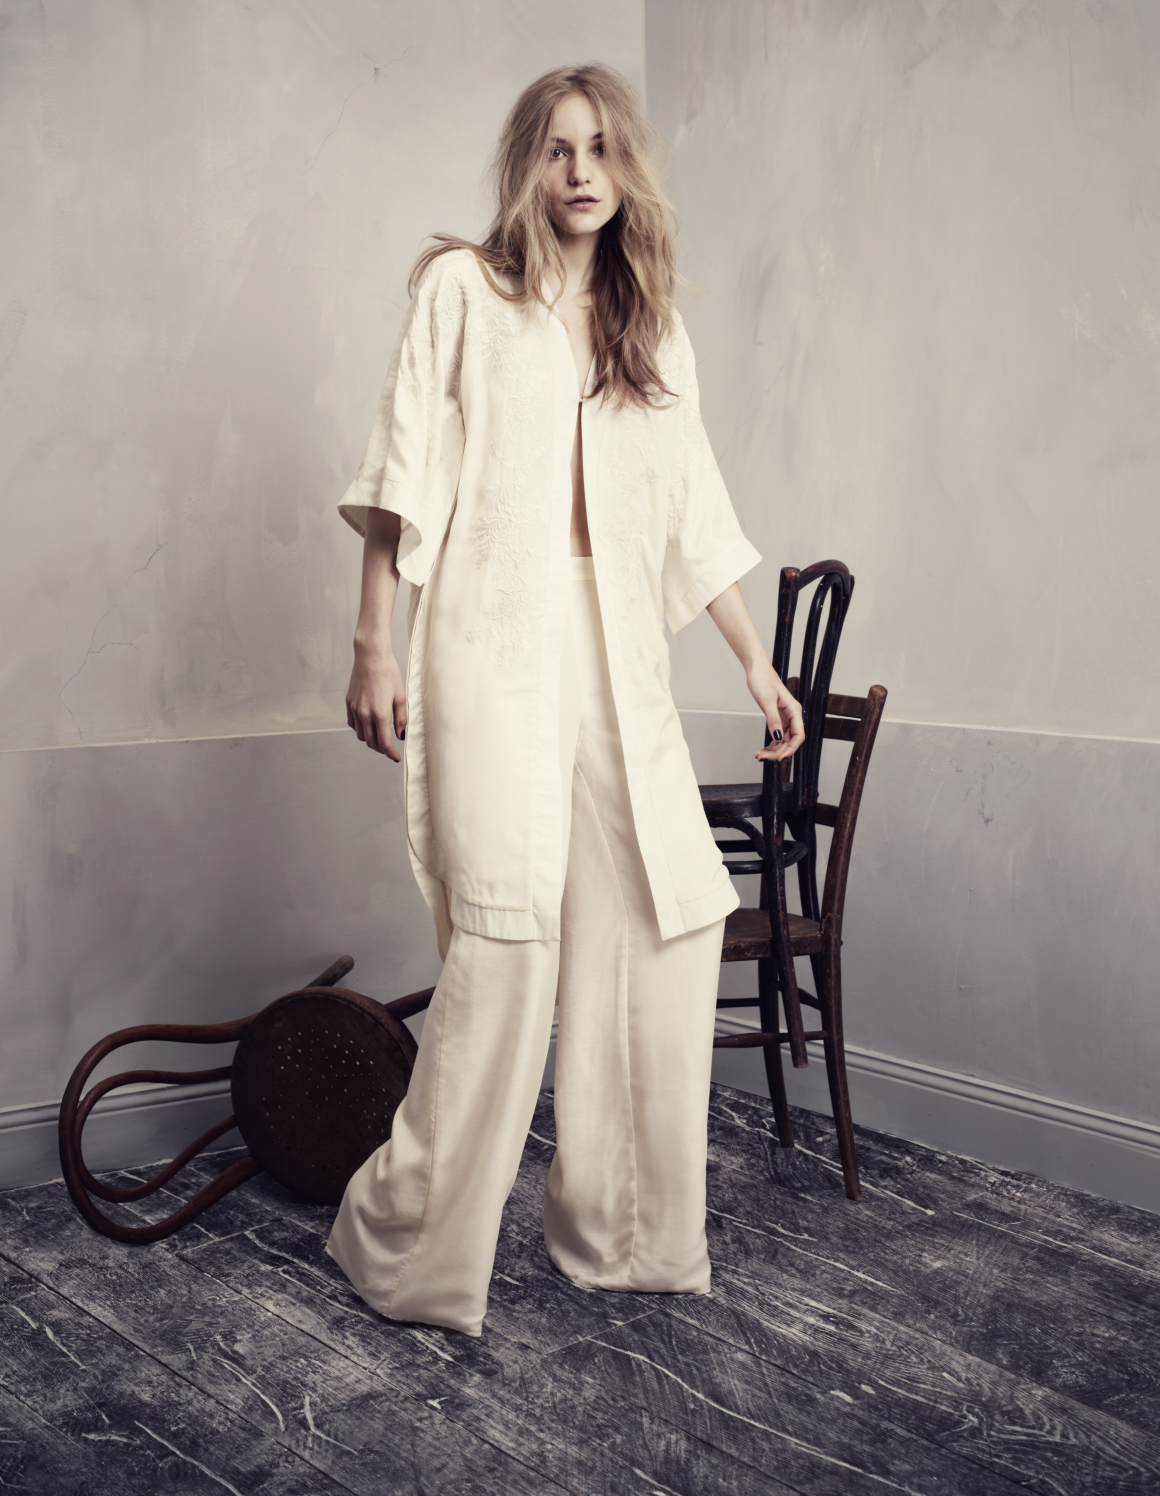 4ff0c3801339 Η χολιγουντιανή λάμψη έρχεται στην H M φέτος την άνοιξη με τη συλλογή  Conscious Exclusive – μια συλλογή με ρούχα για πάρτυ από πιο φιλικά προς το  περιβάλλον ...